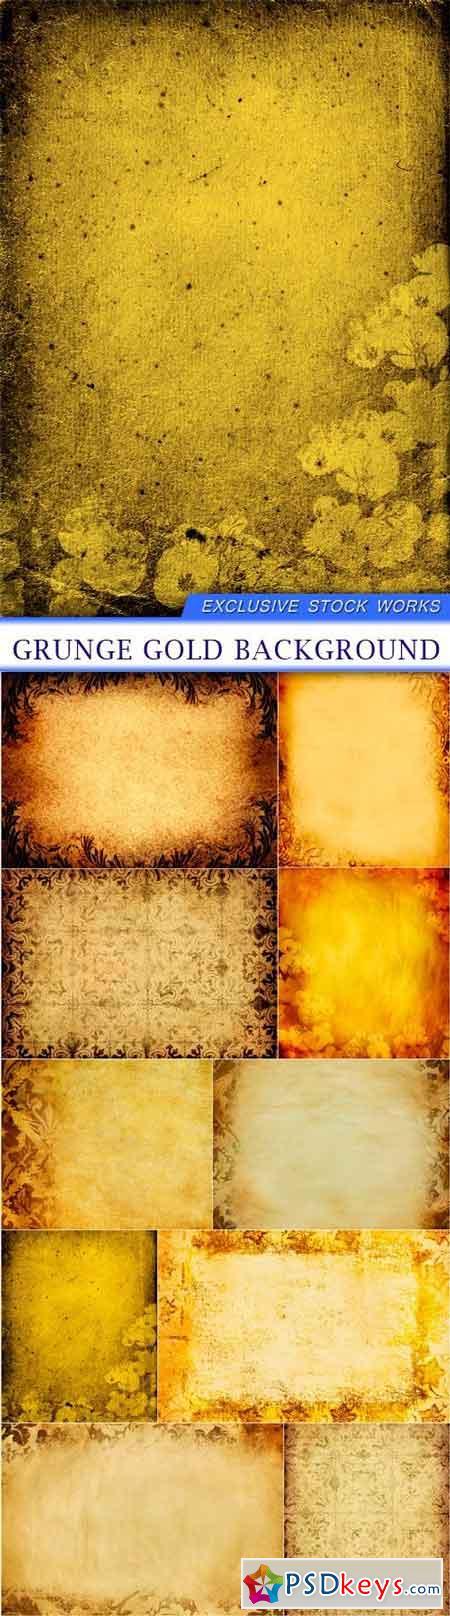 Grunge gold background 10X JPEG